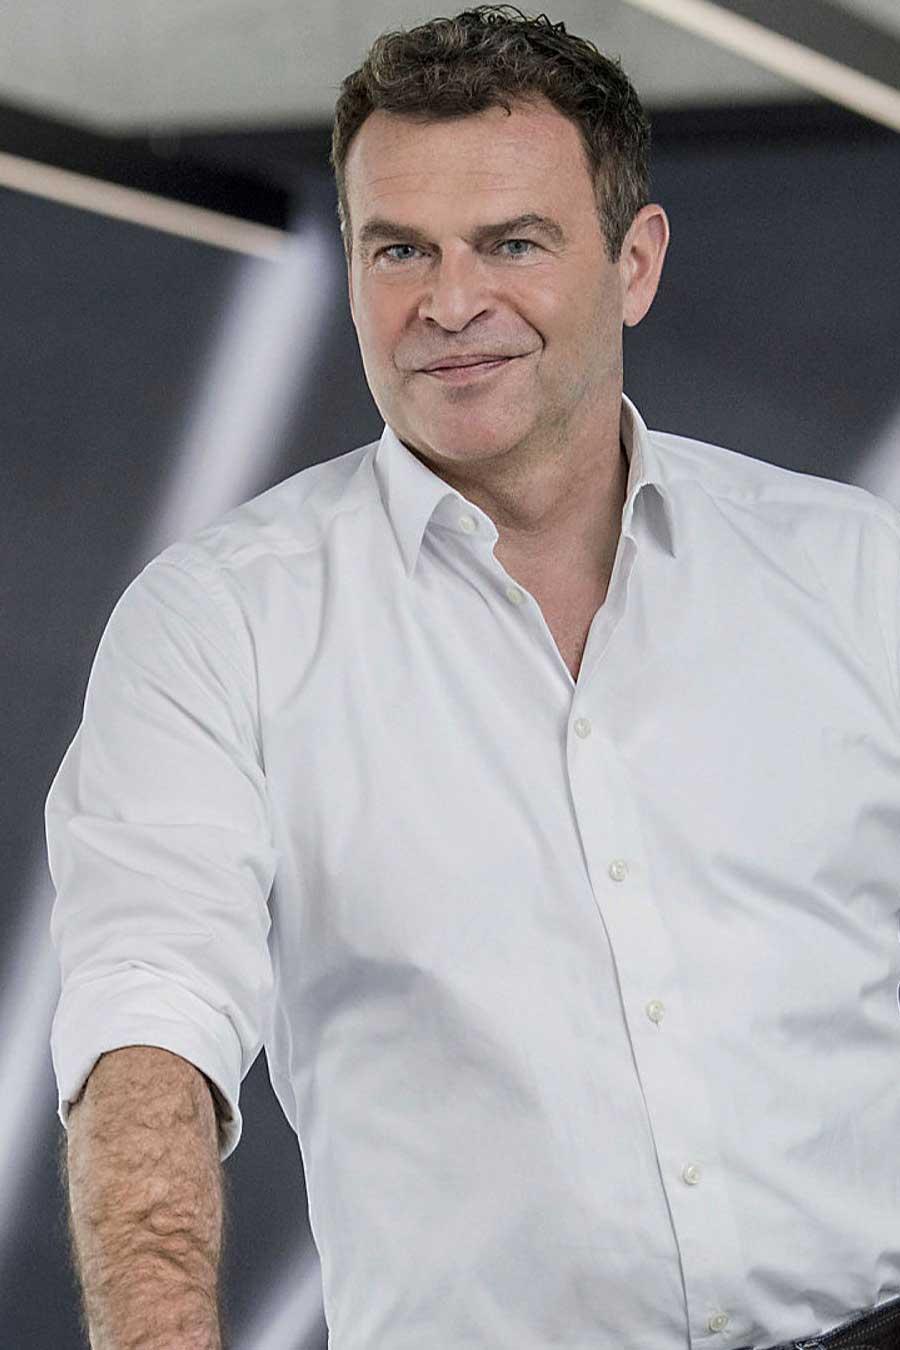 Tobias Moers, Aston Martin Lagonda's Chief Executive Officer